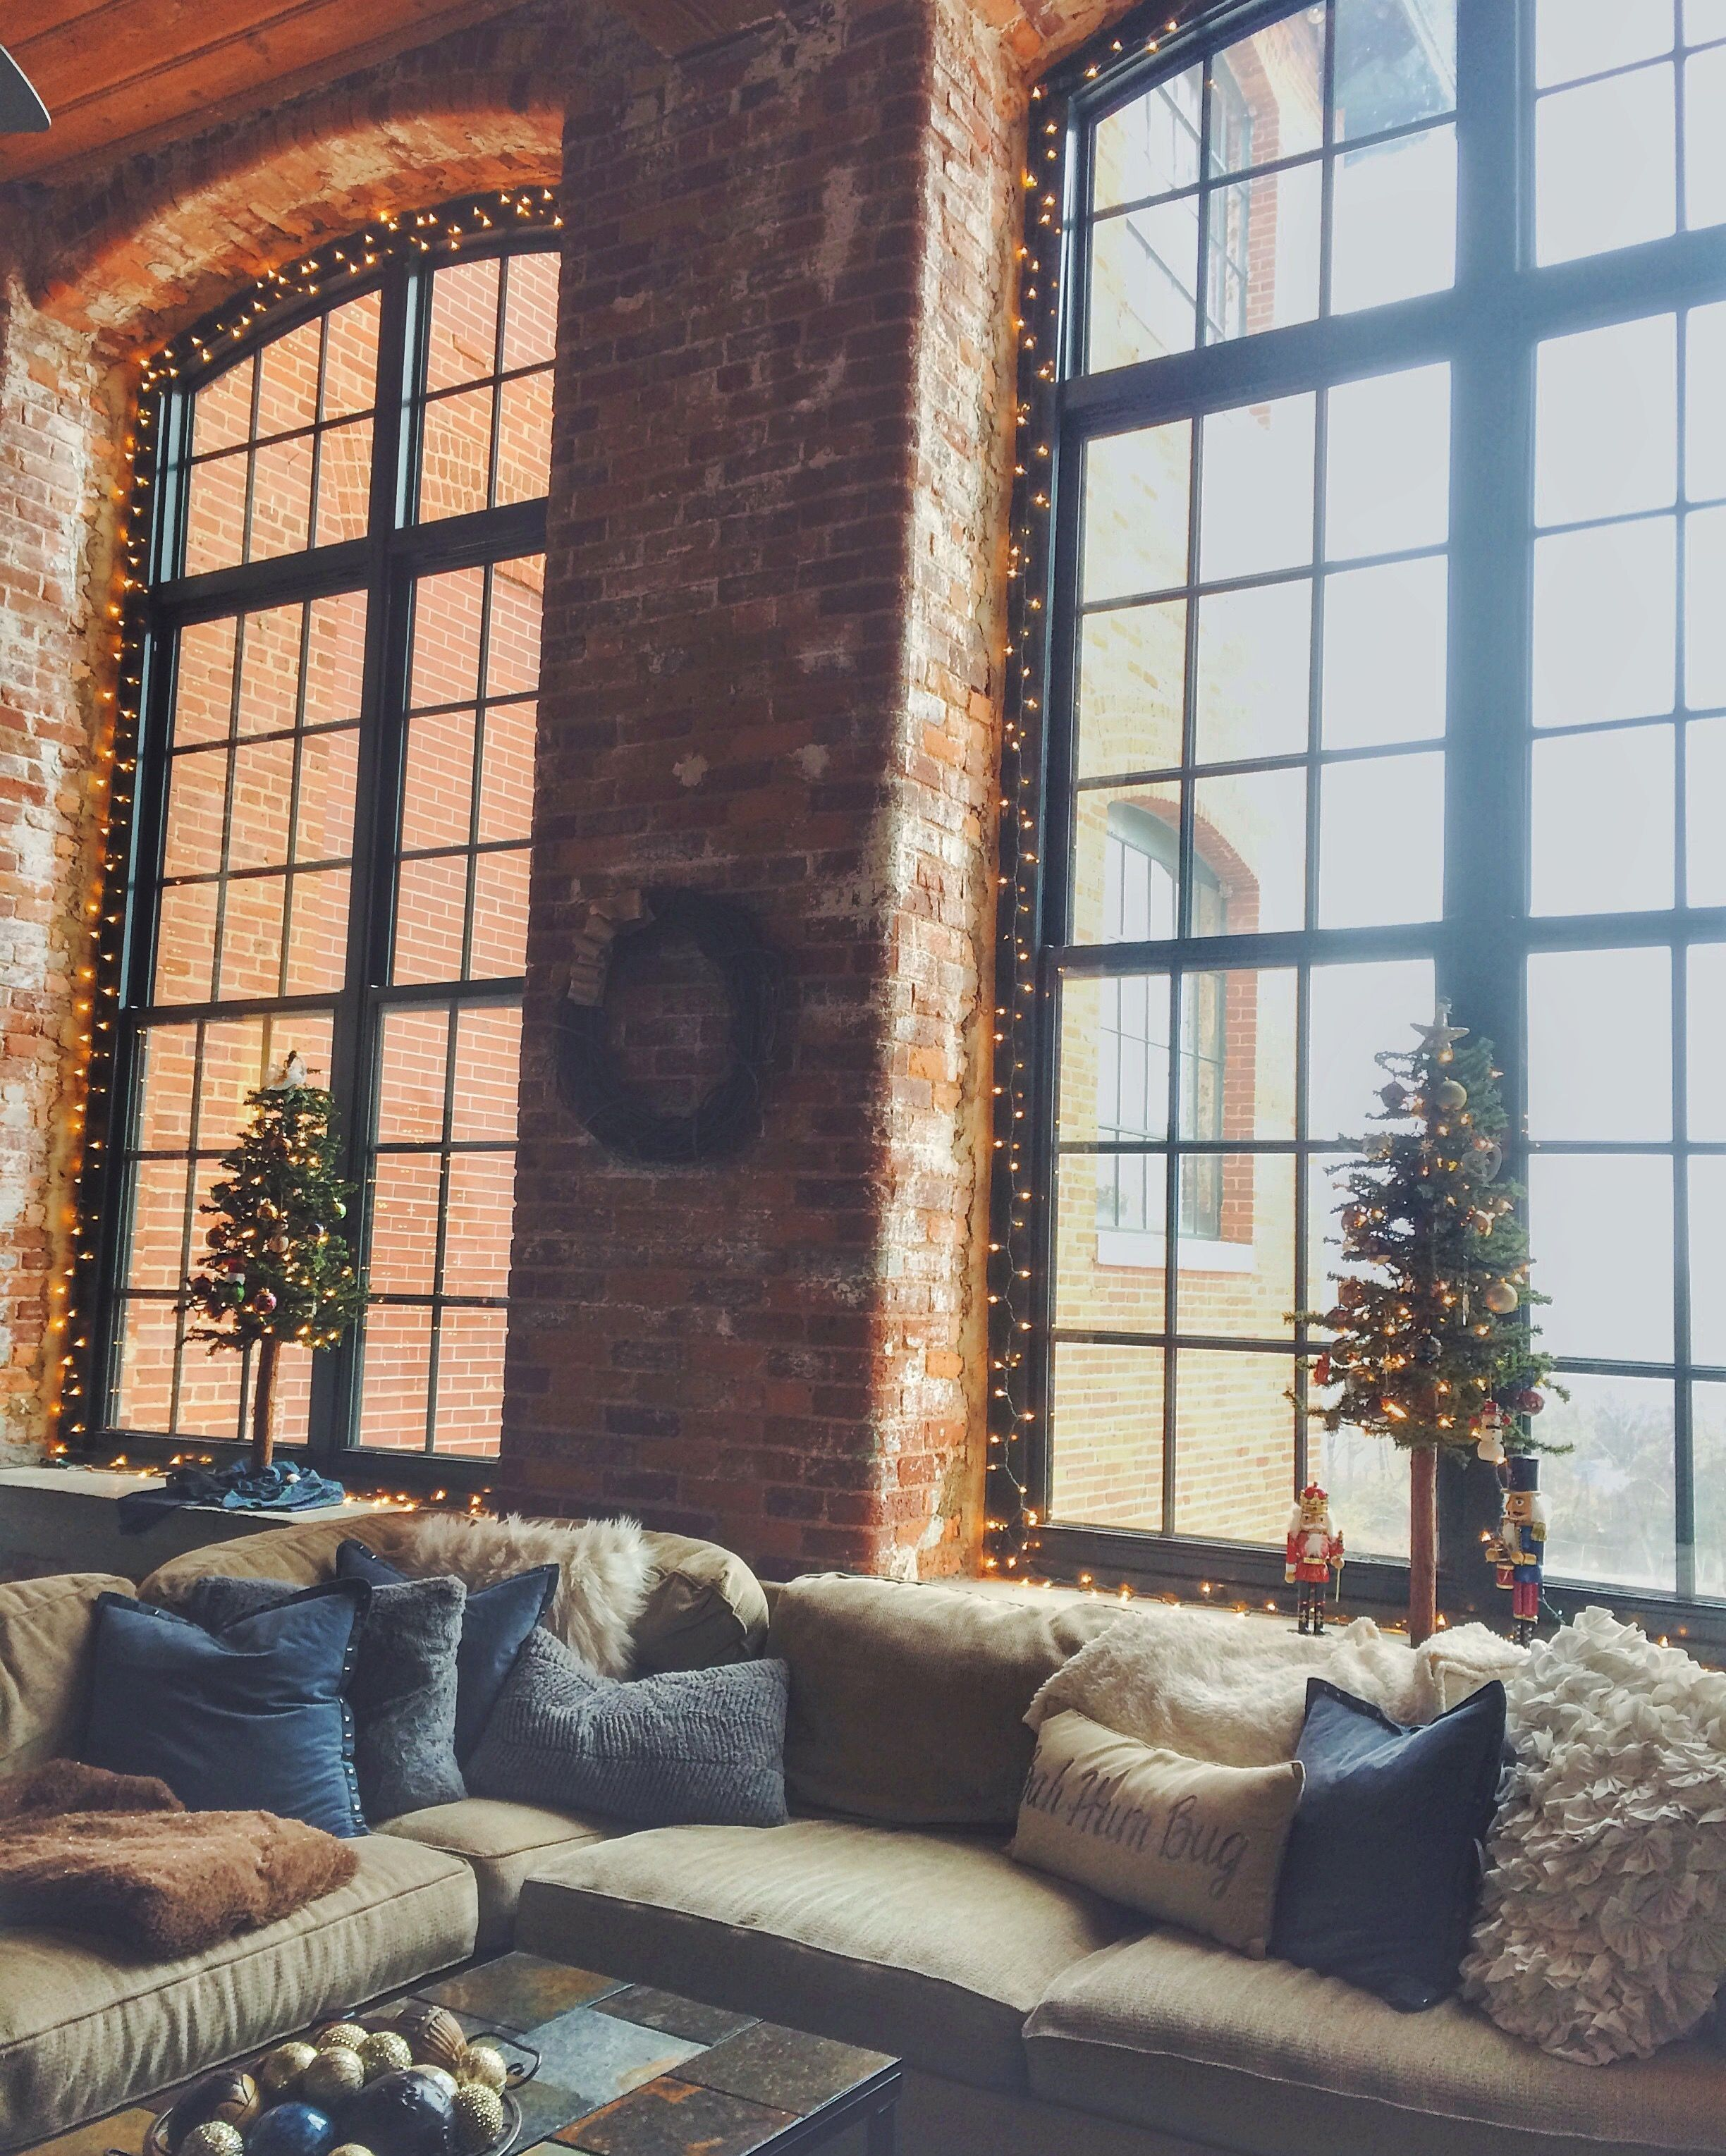 Cozyapartment Ideas: Pretty Photo Of Cozy Apartment Decor